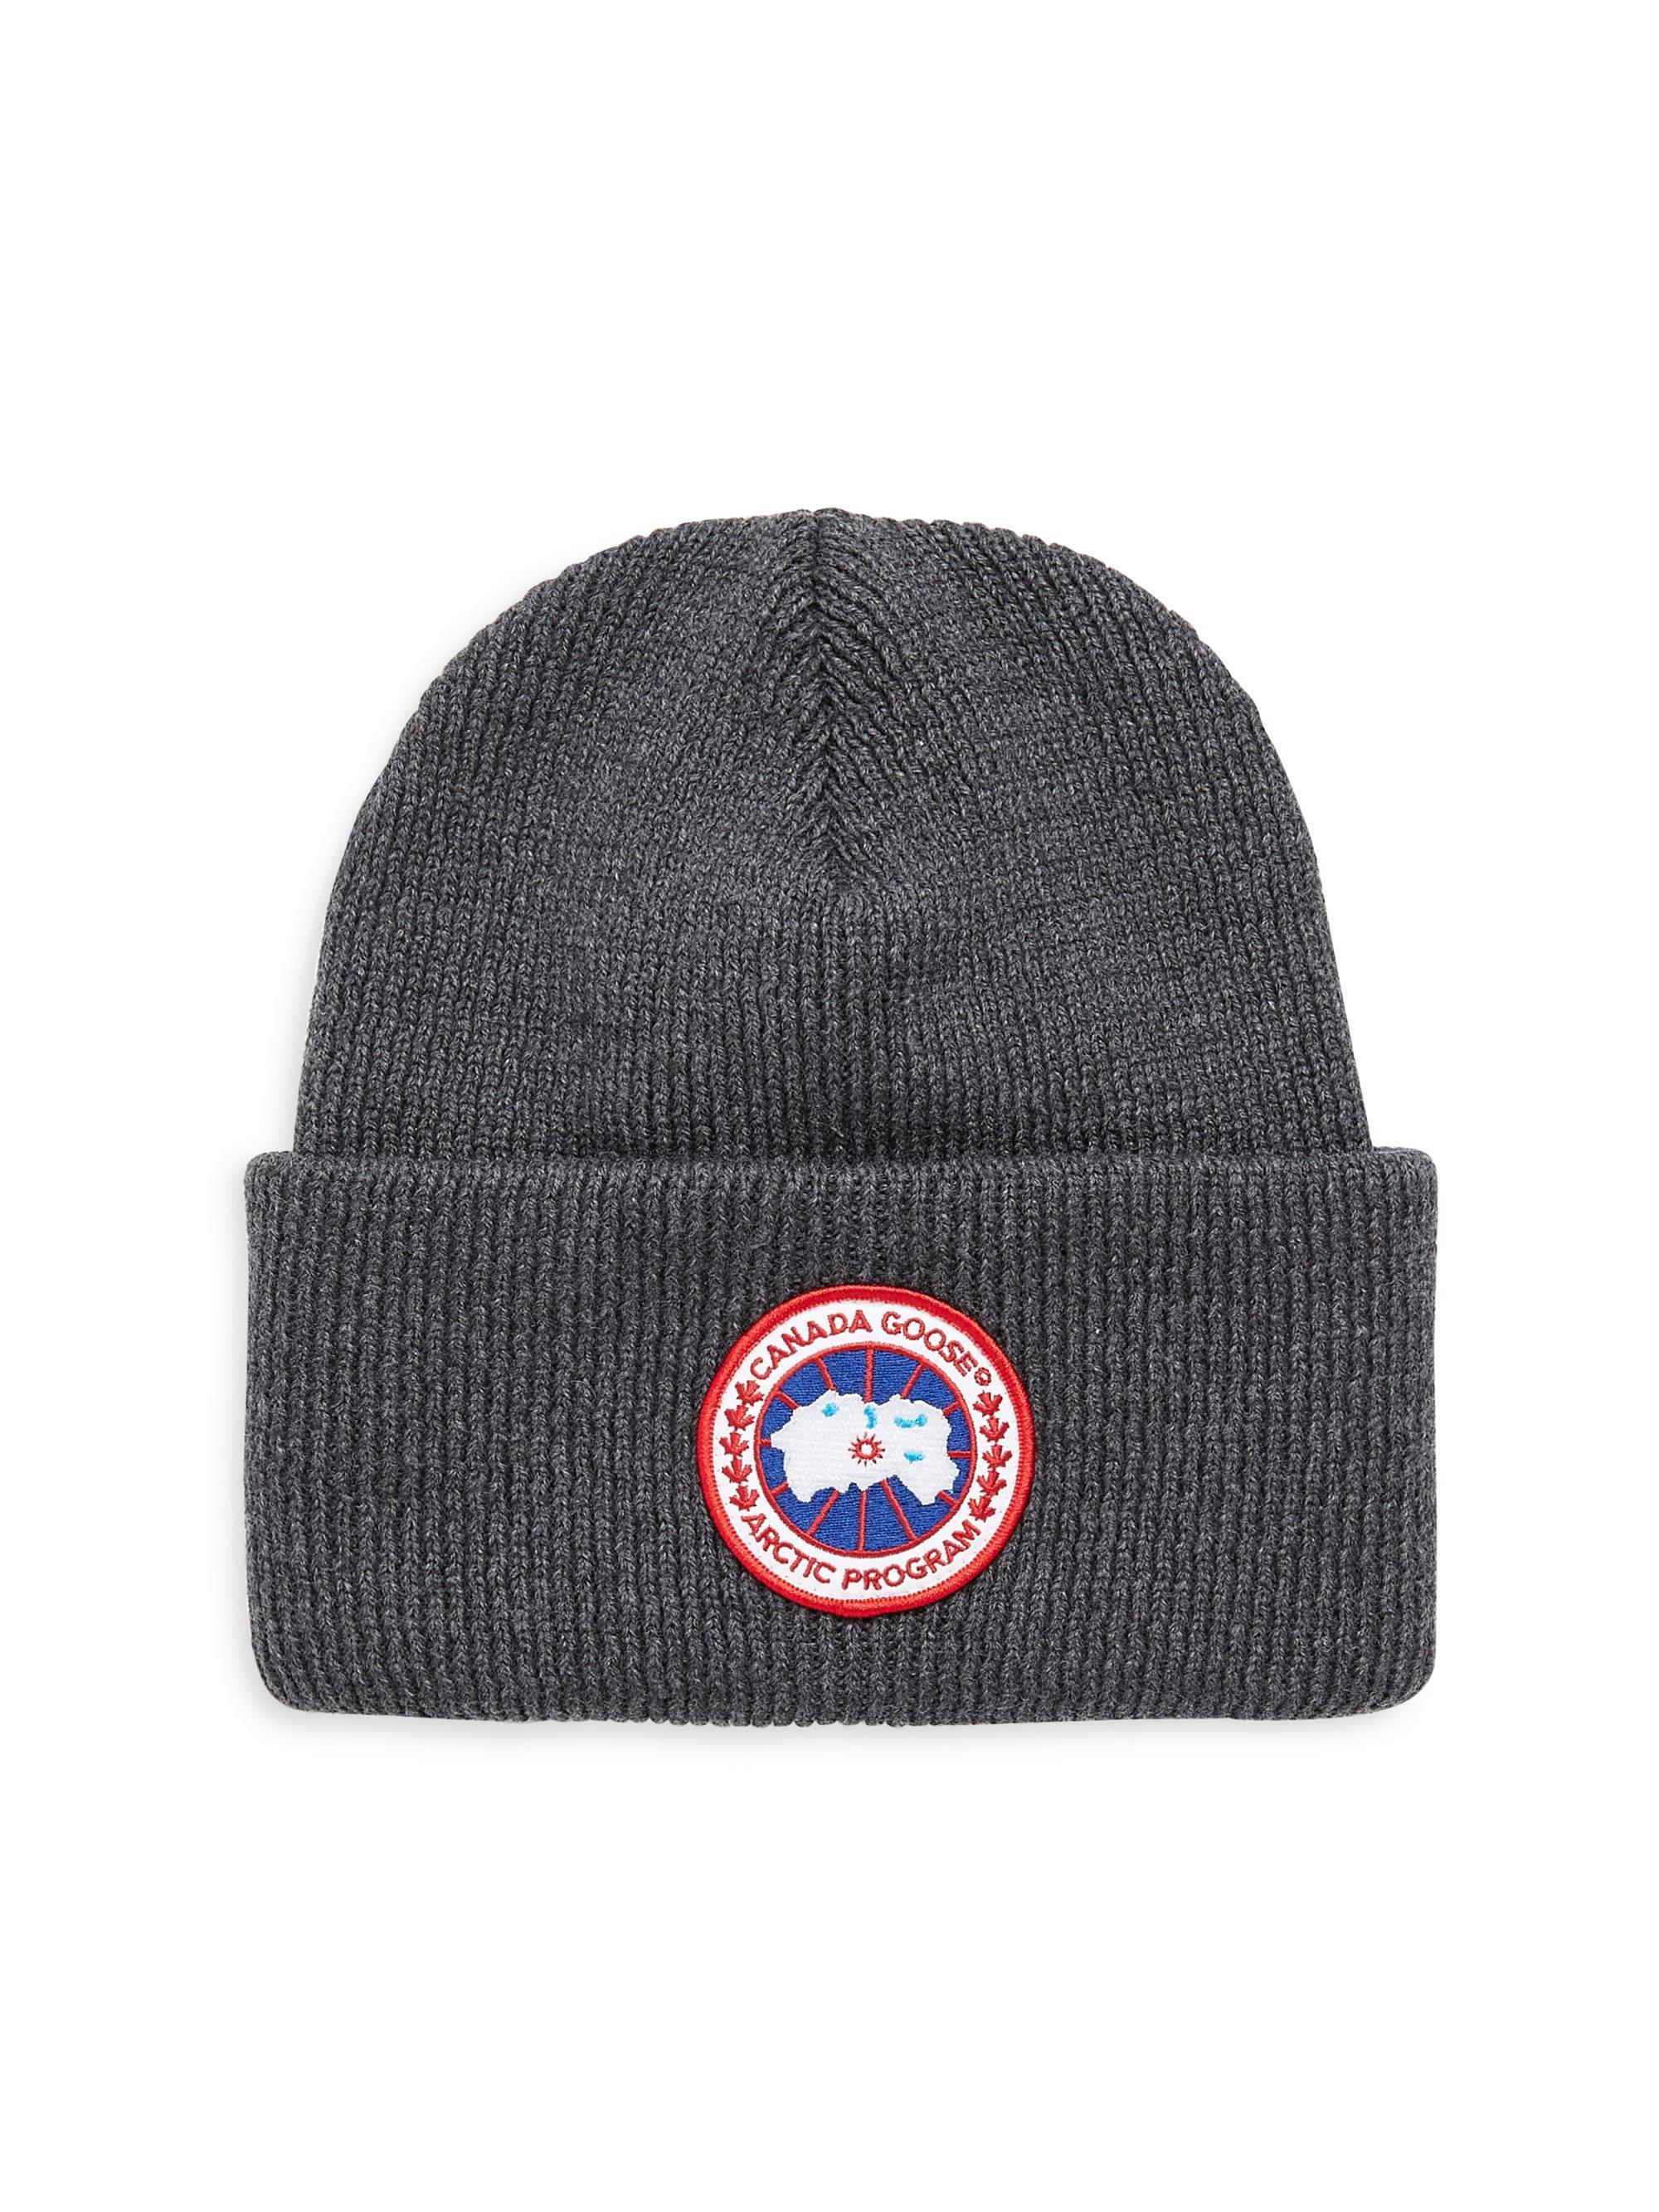 4e6de4fda14 Canada Goose Arctic Wool Beanie in Gray for Men - Lyst